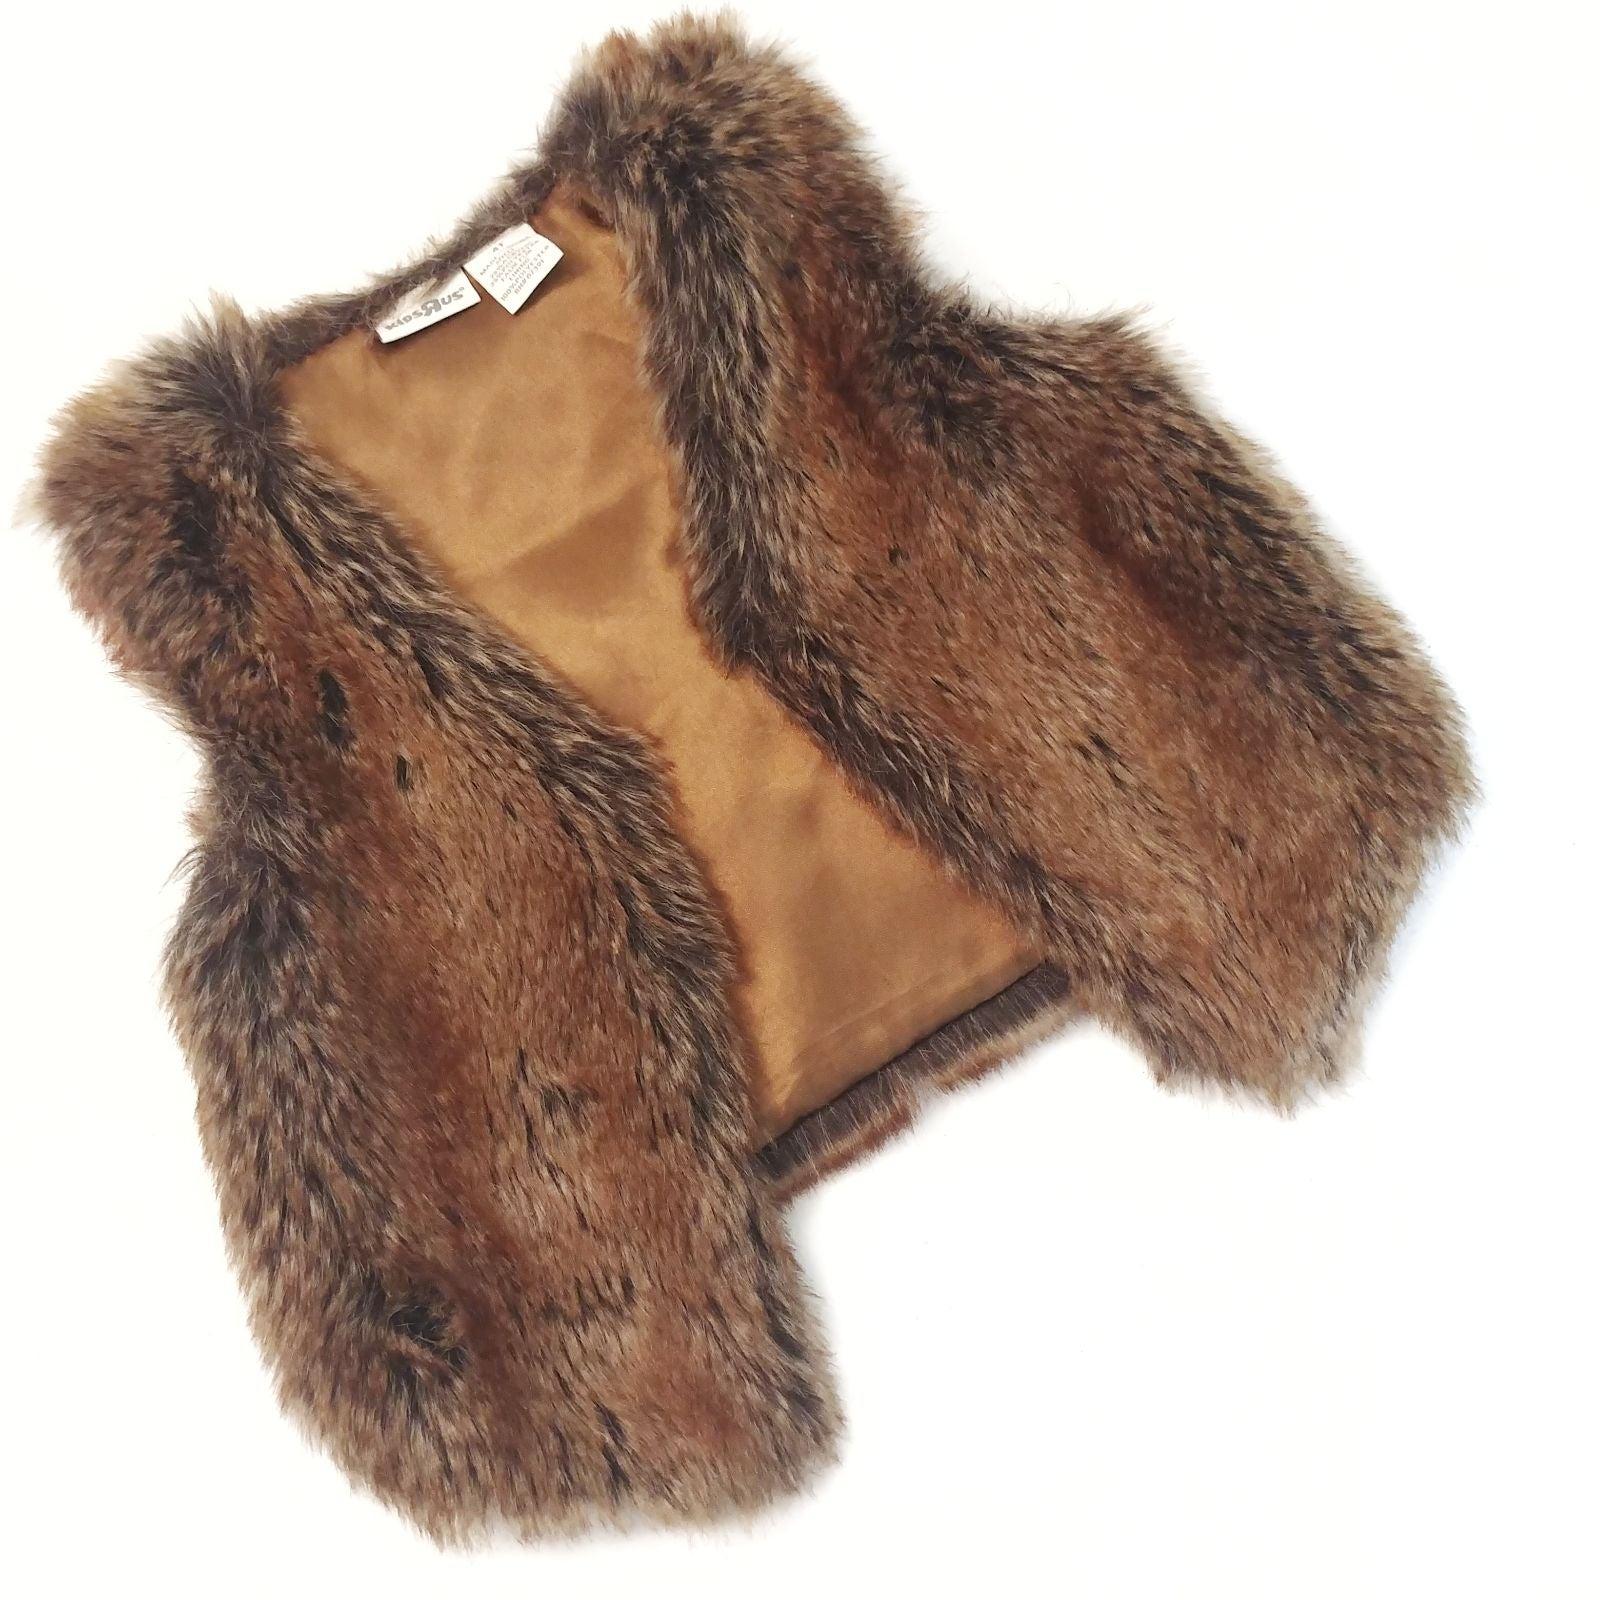 Girl's Faux Fur Vest Kids R Us Brown